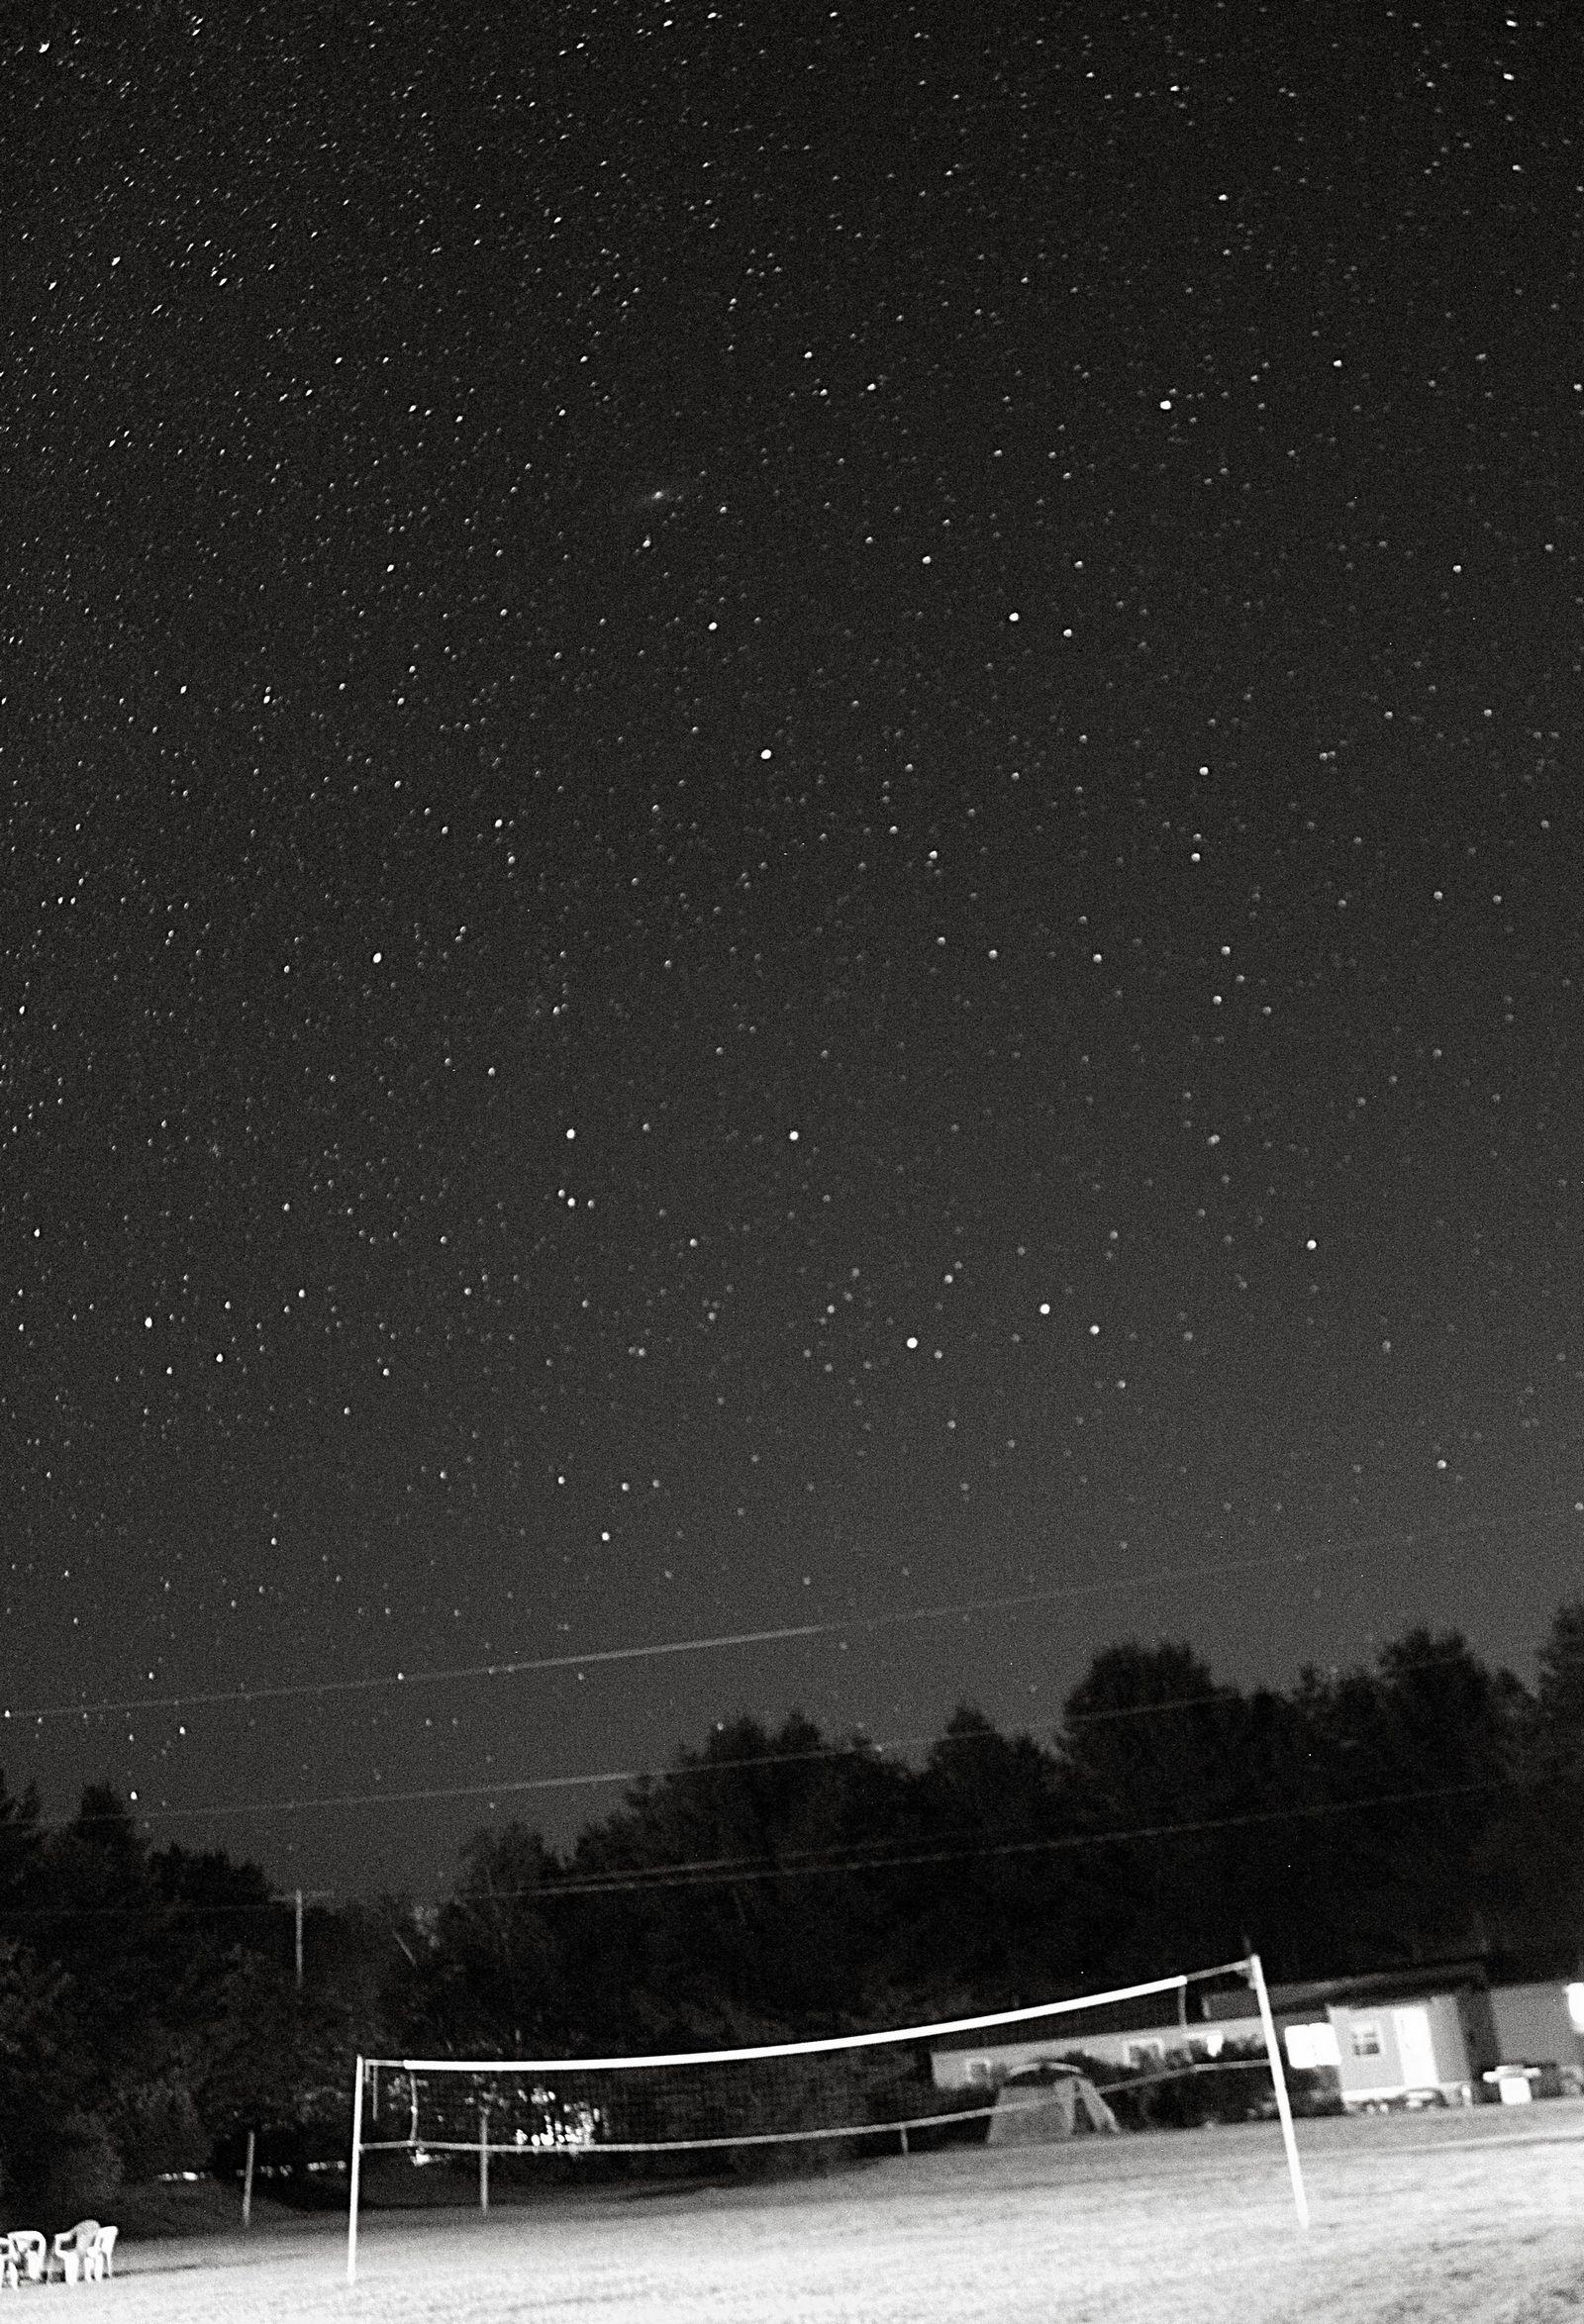 No soy un fotógrafo astronómico, toma 2